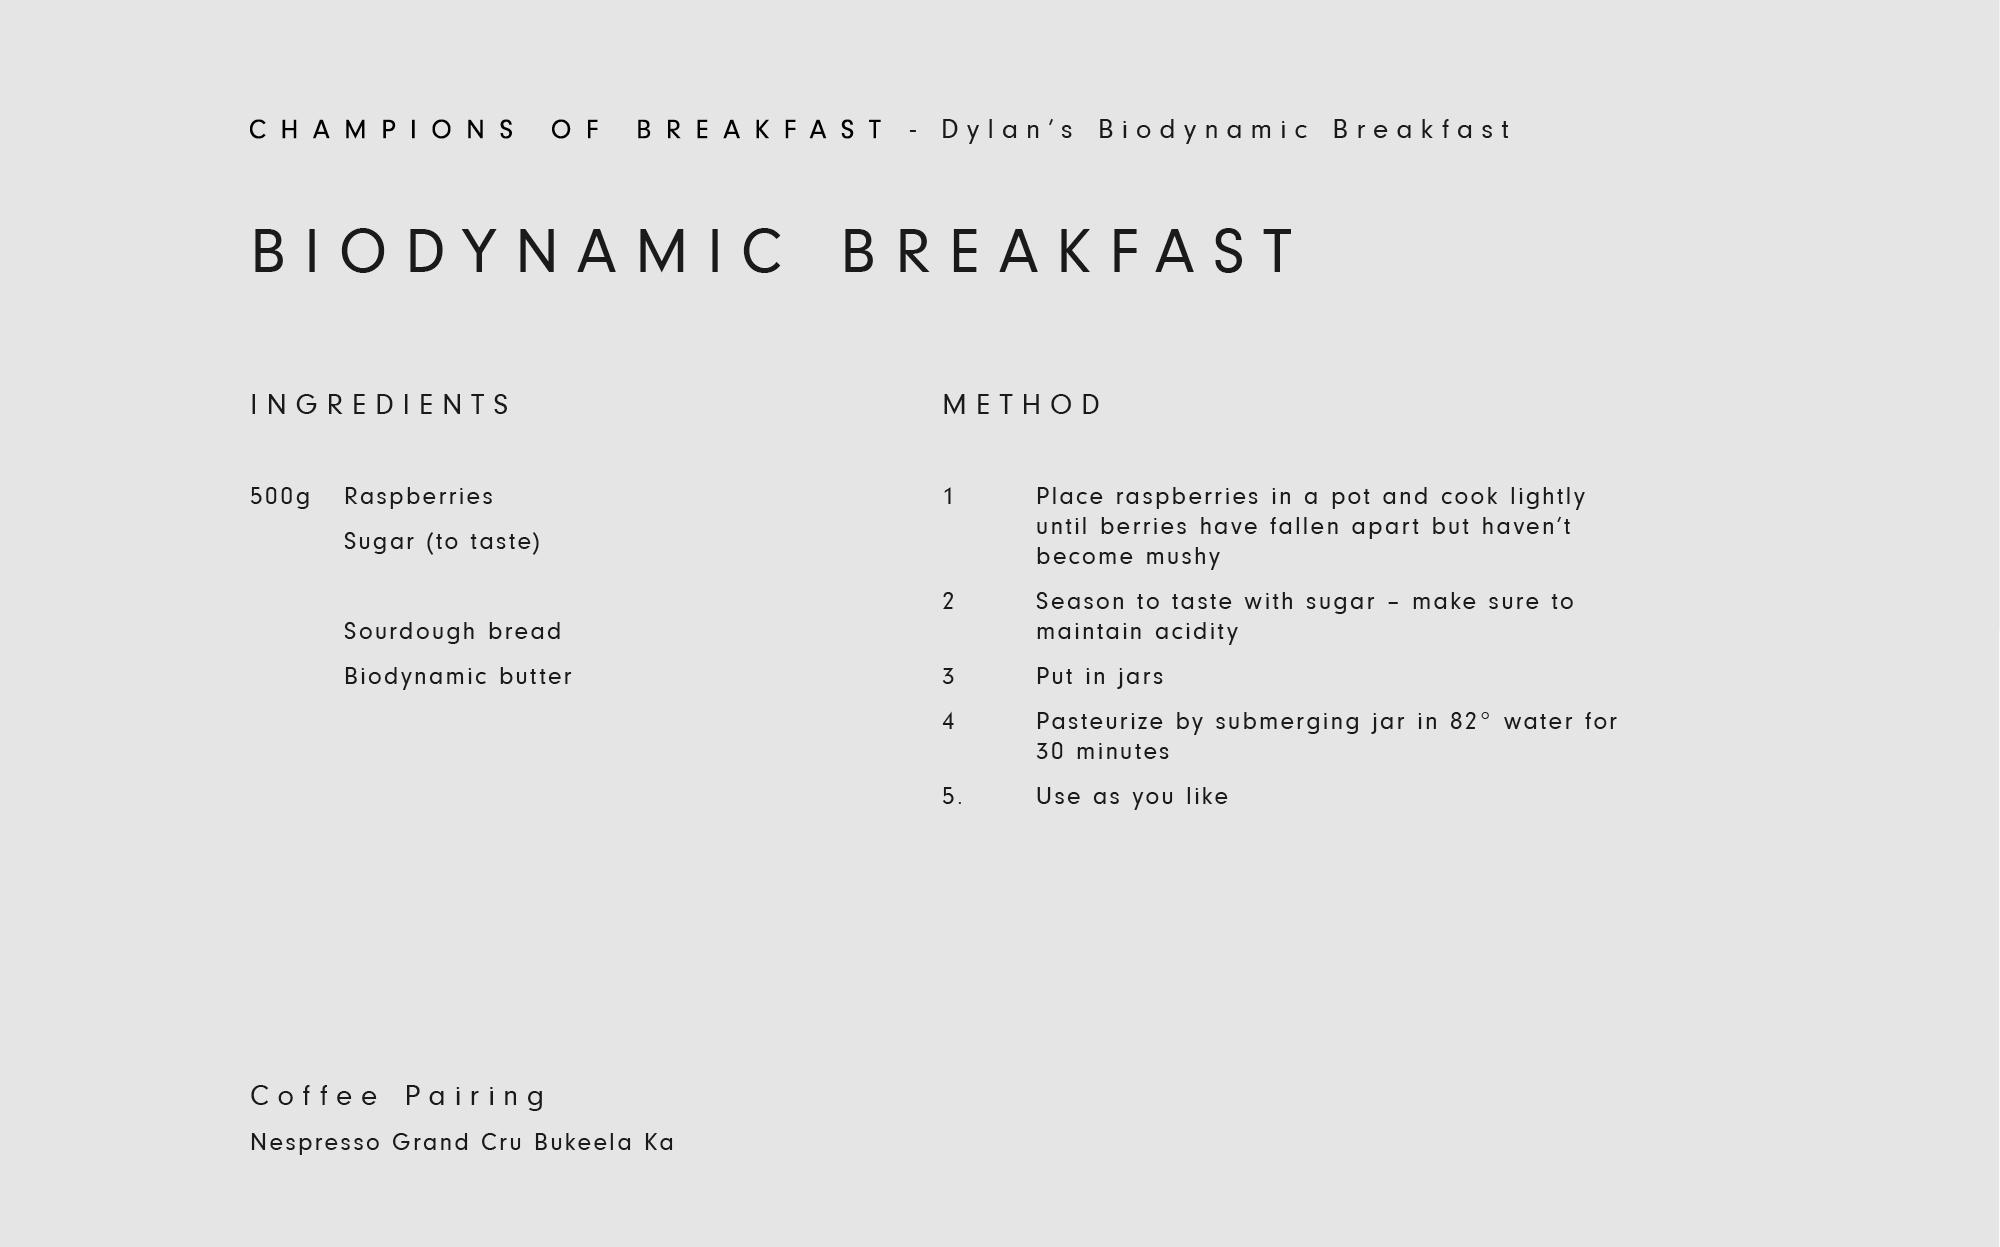 Dylan's Recipe